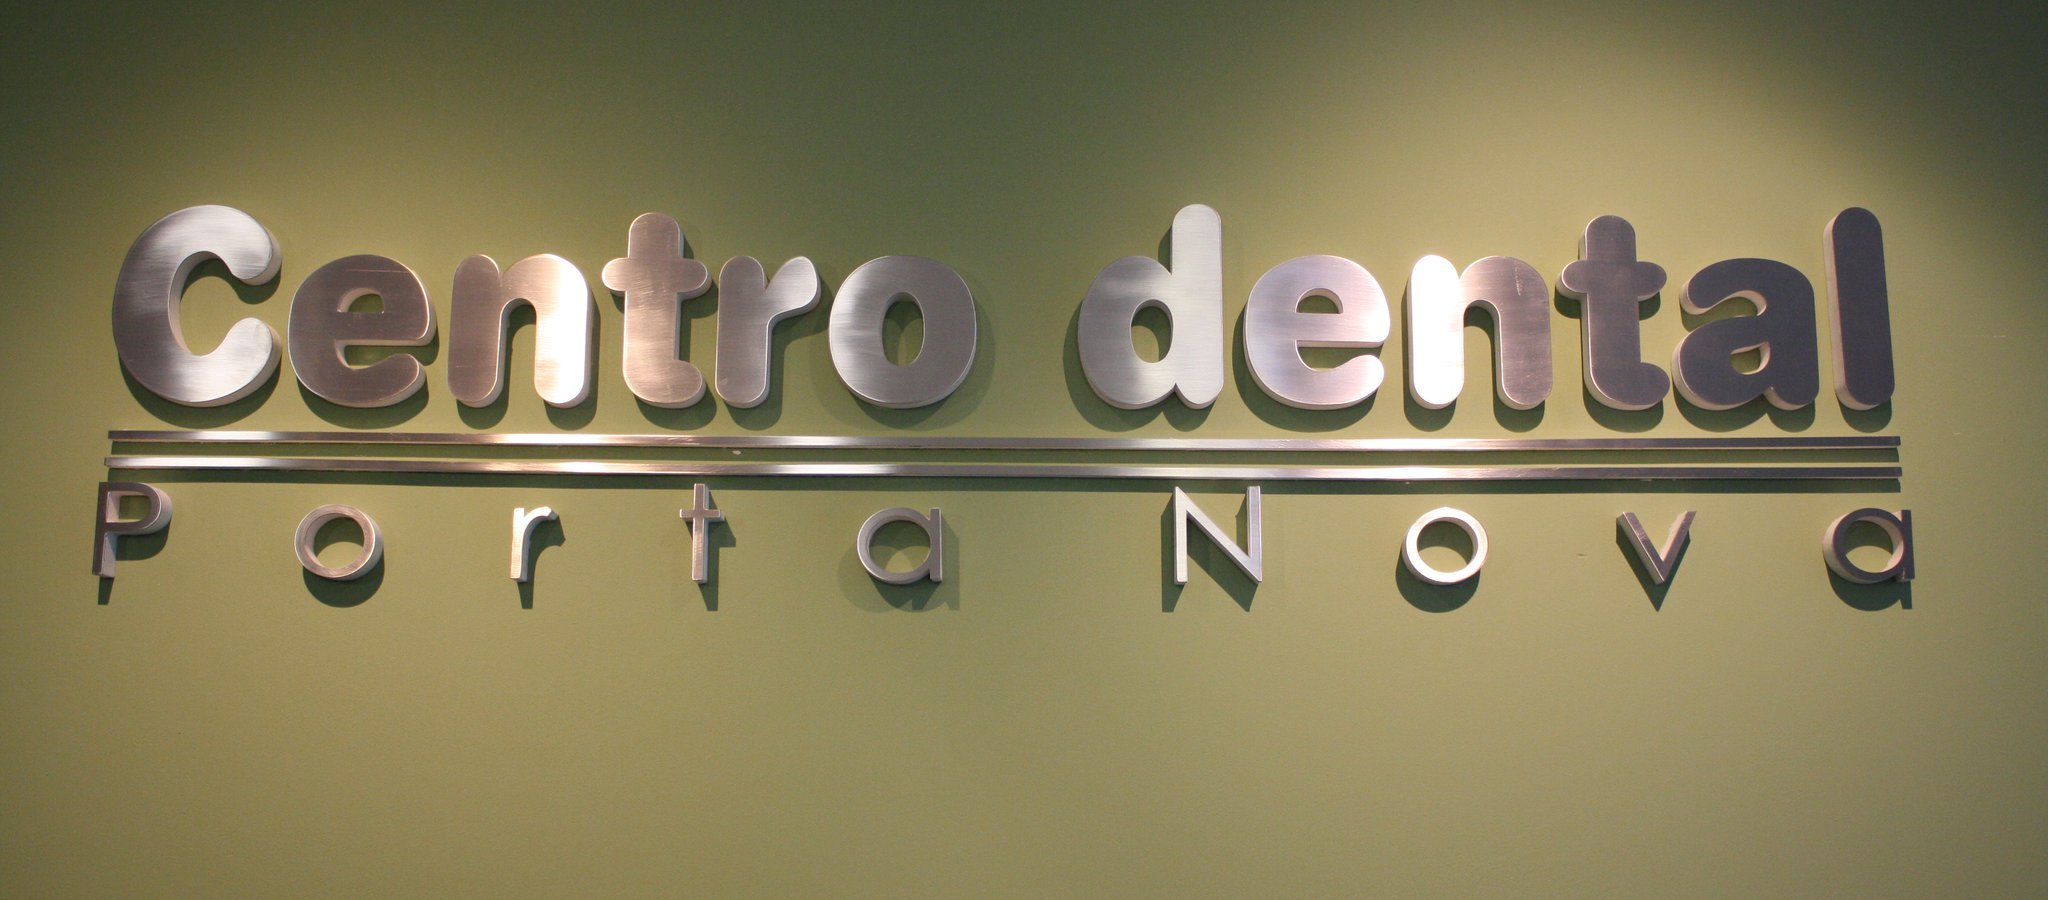 Entrada Centro dental Porta Nova